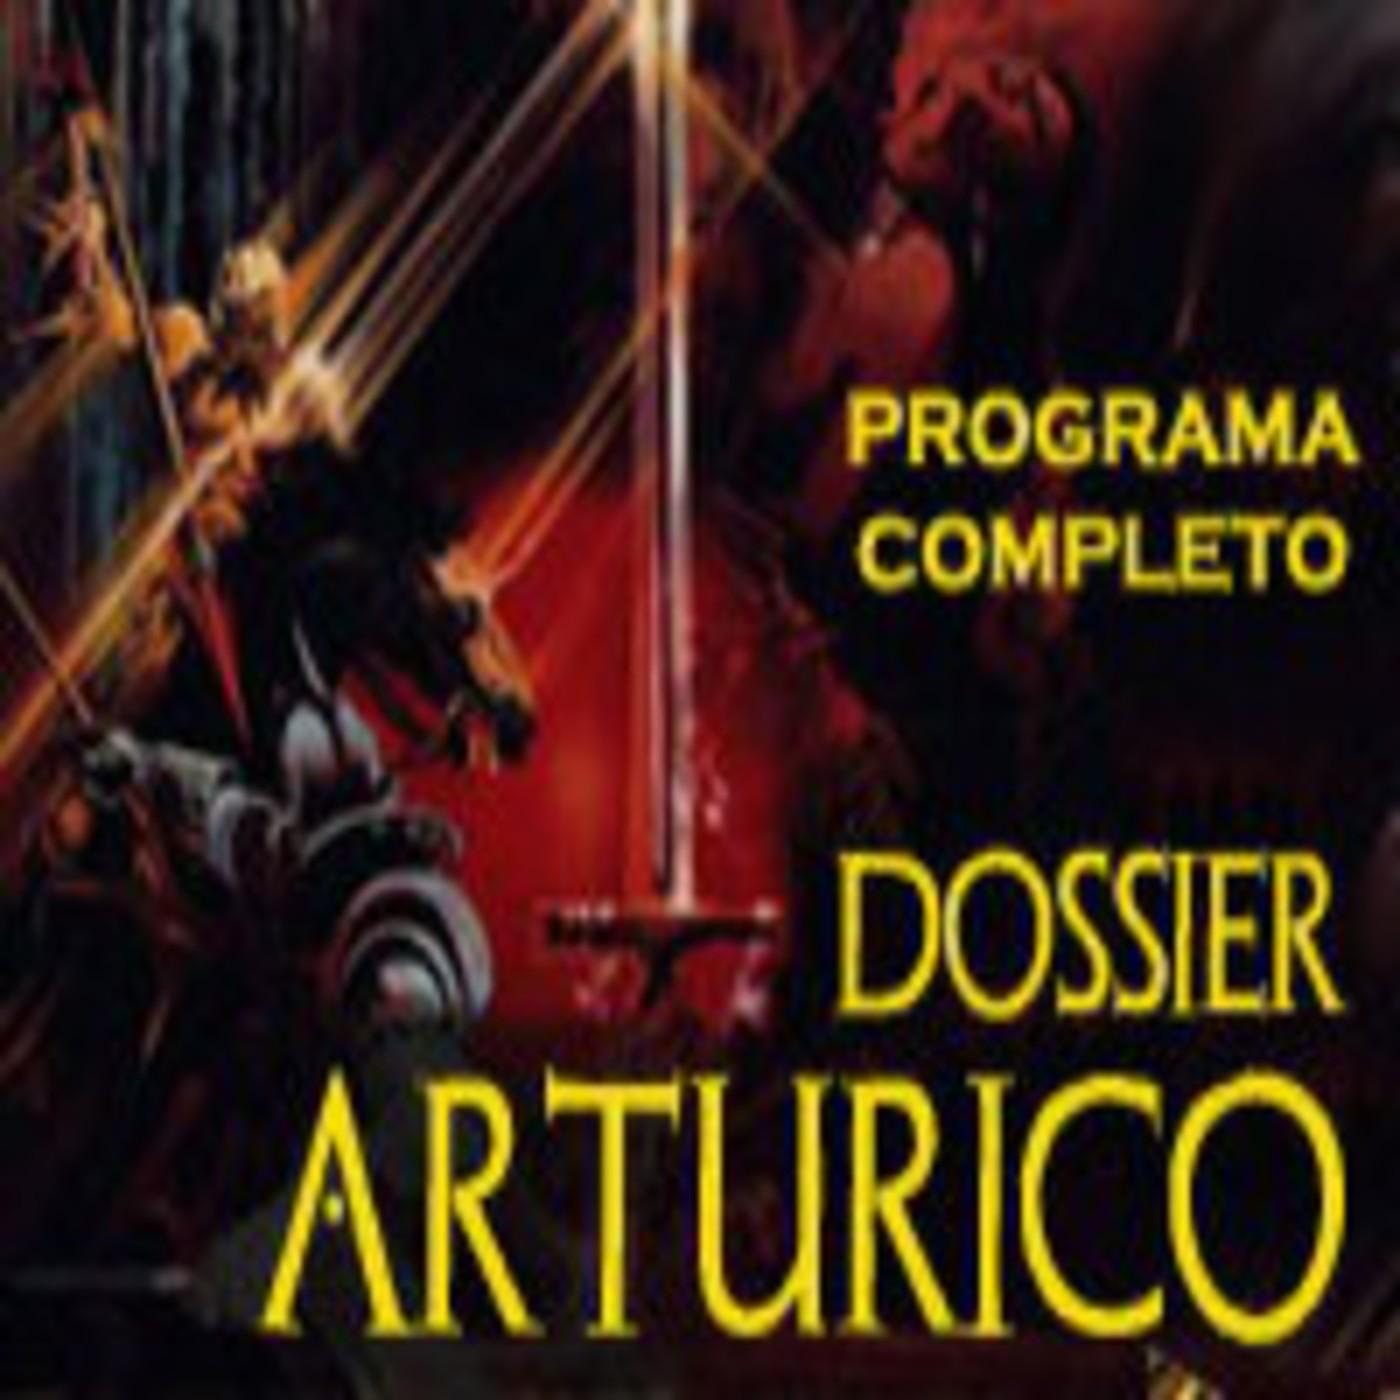 LODE 2x42 Dossier ARTÚRICO -programa completo-